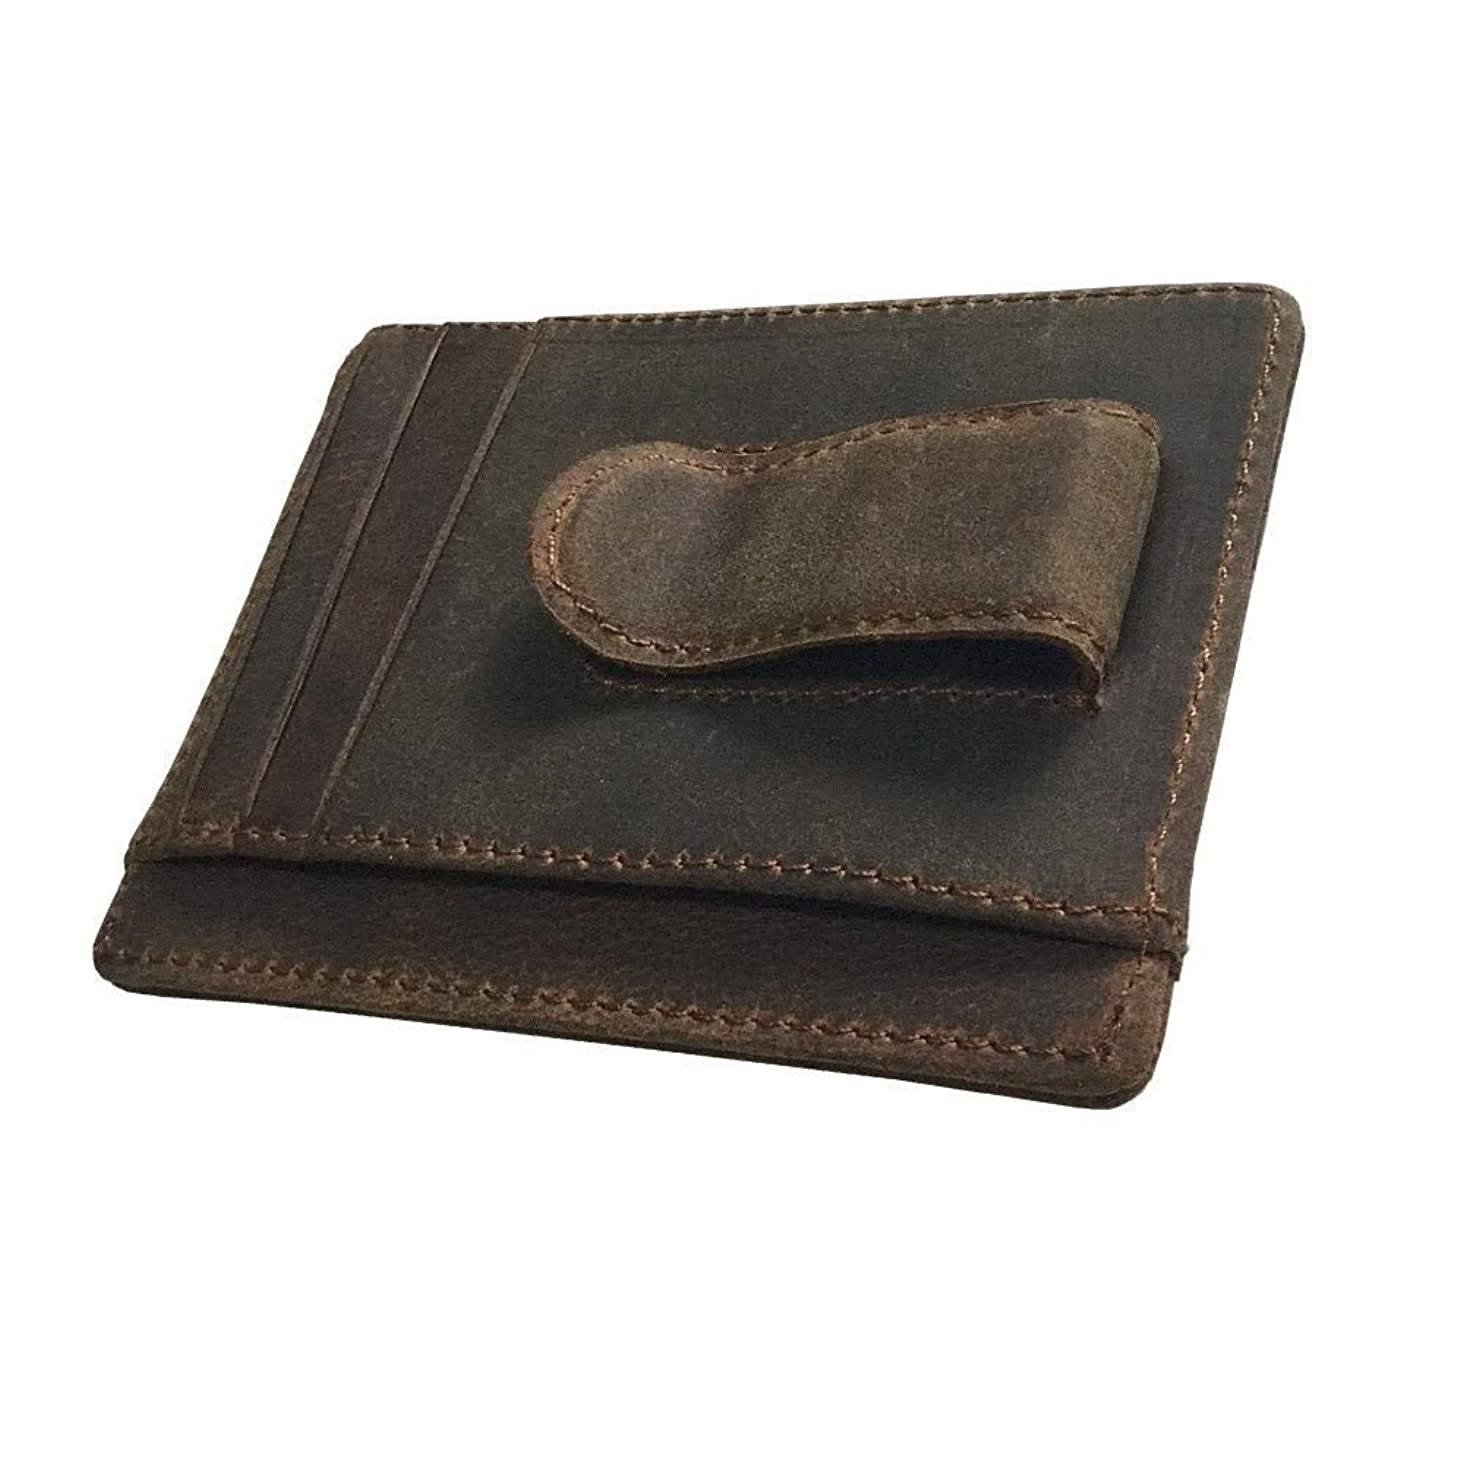 Mens Money Clip Genuine Leather Minimalist Slim Front Pocket Purse Spring Clip Wallet